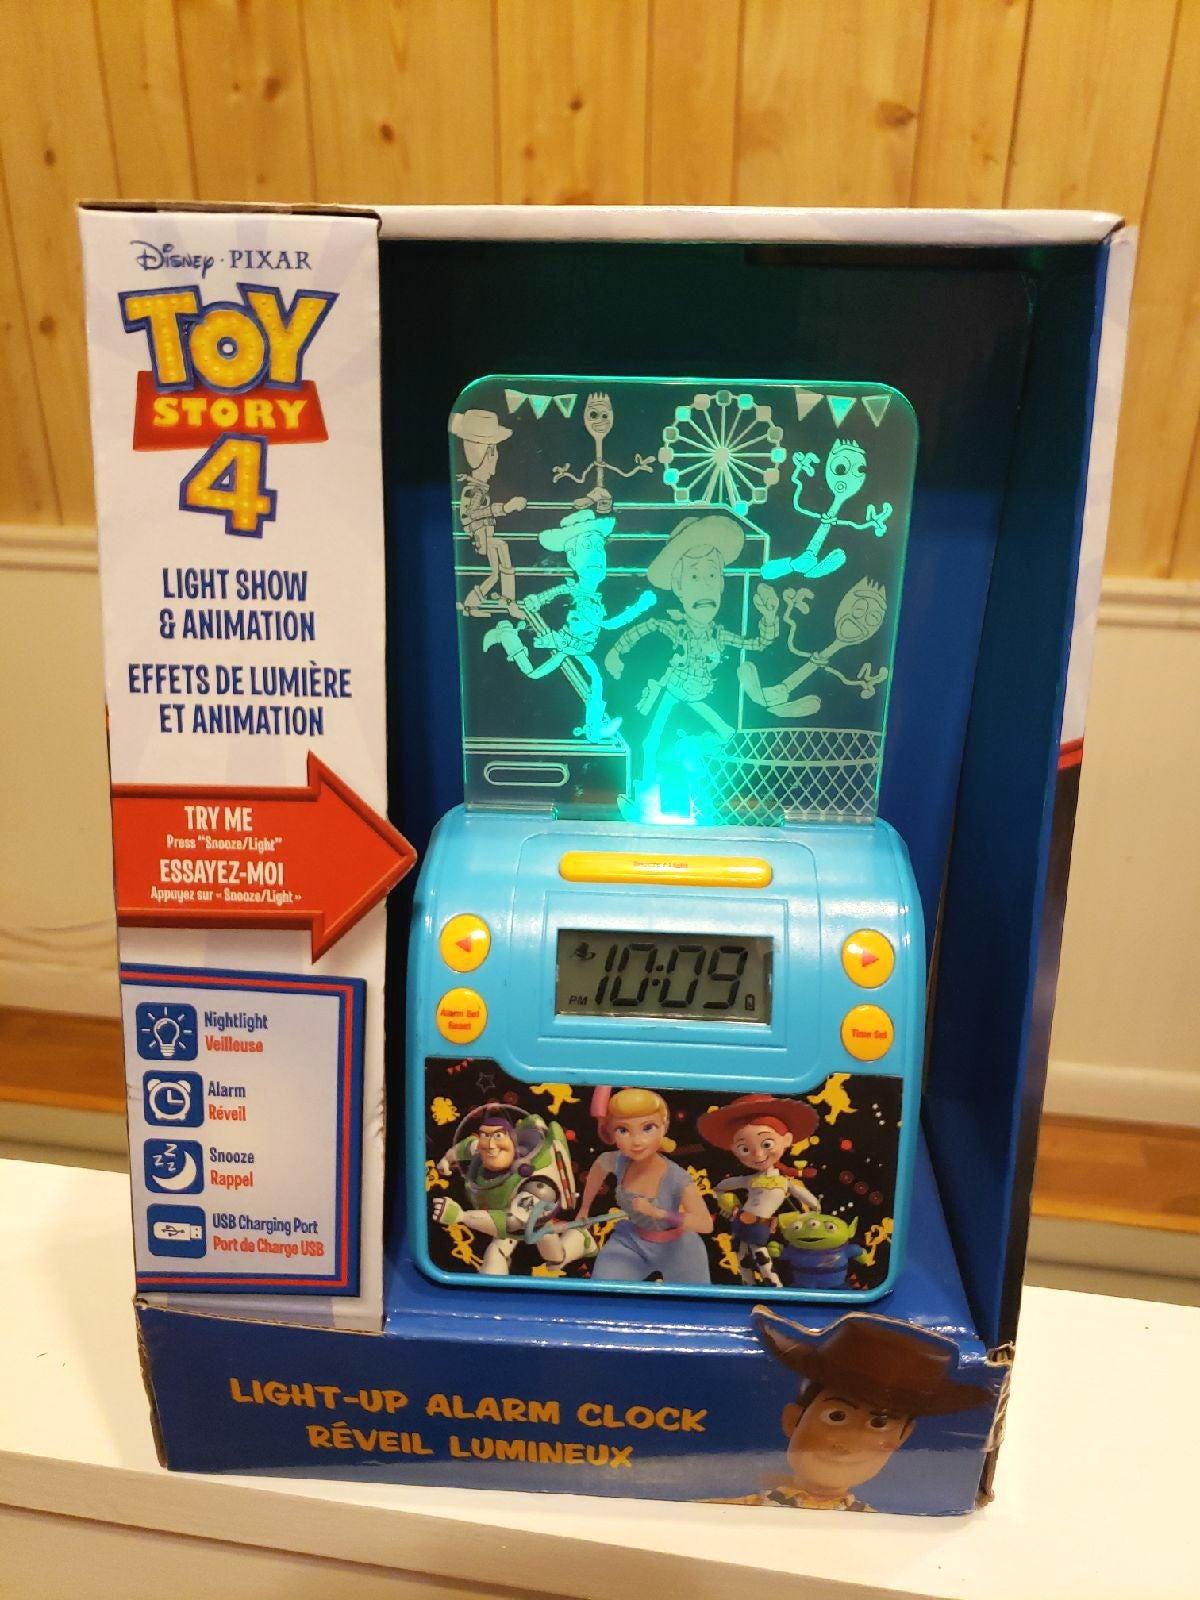 Light-up Toy Story Nightlight Alarm